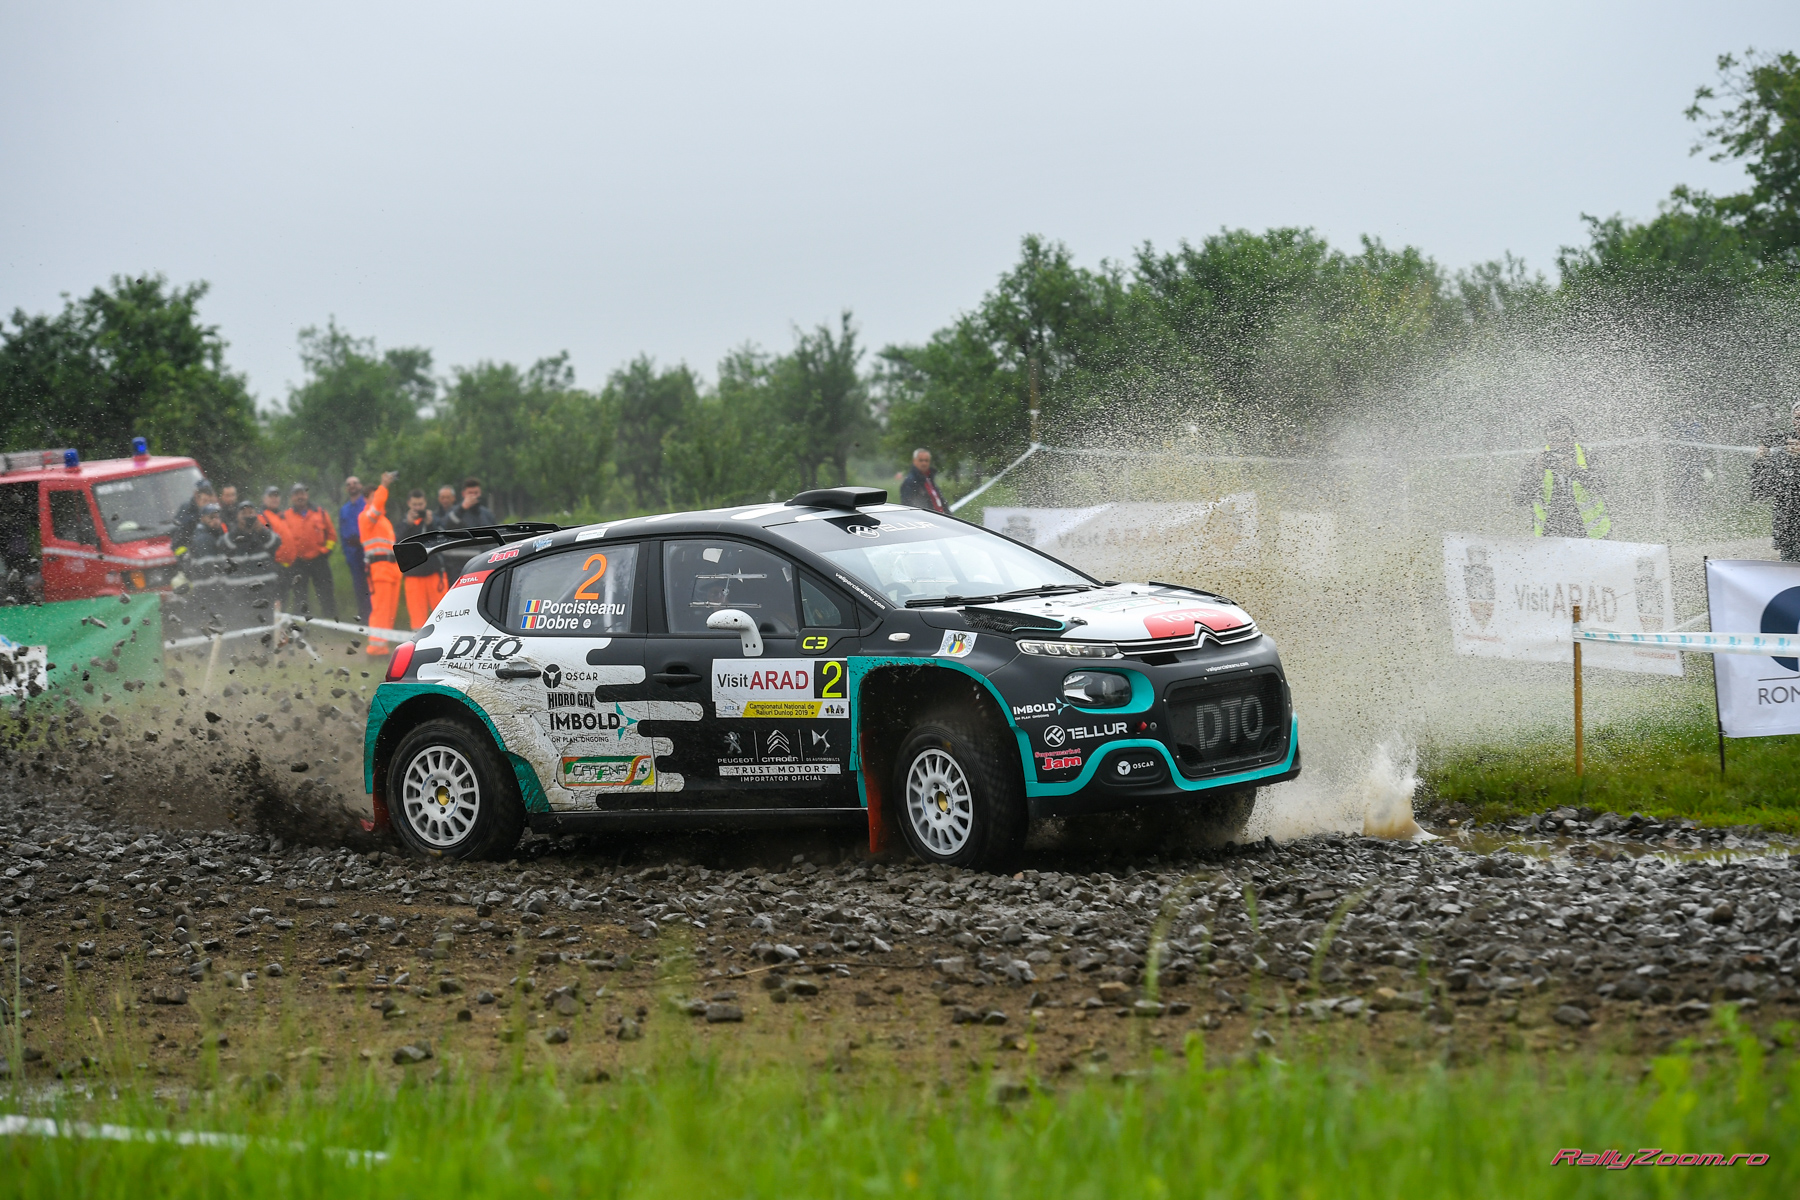 DTO Rally Team porneste in Raliul Moldovei 2019 cu dorinta victoriei